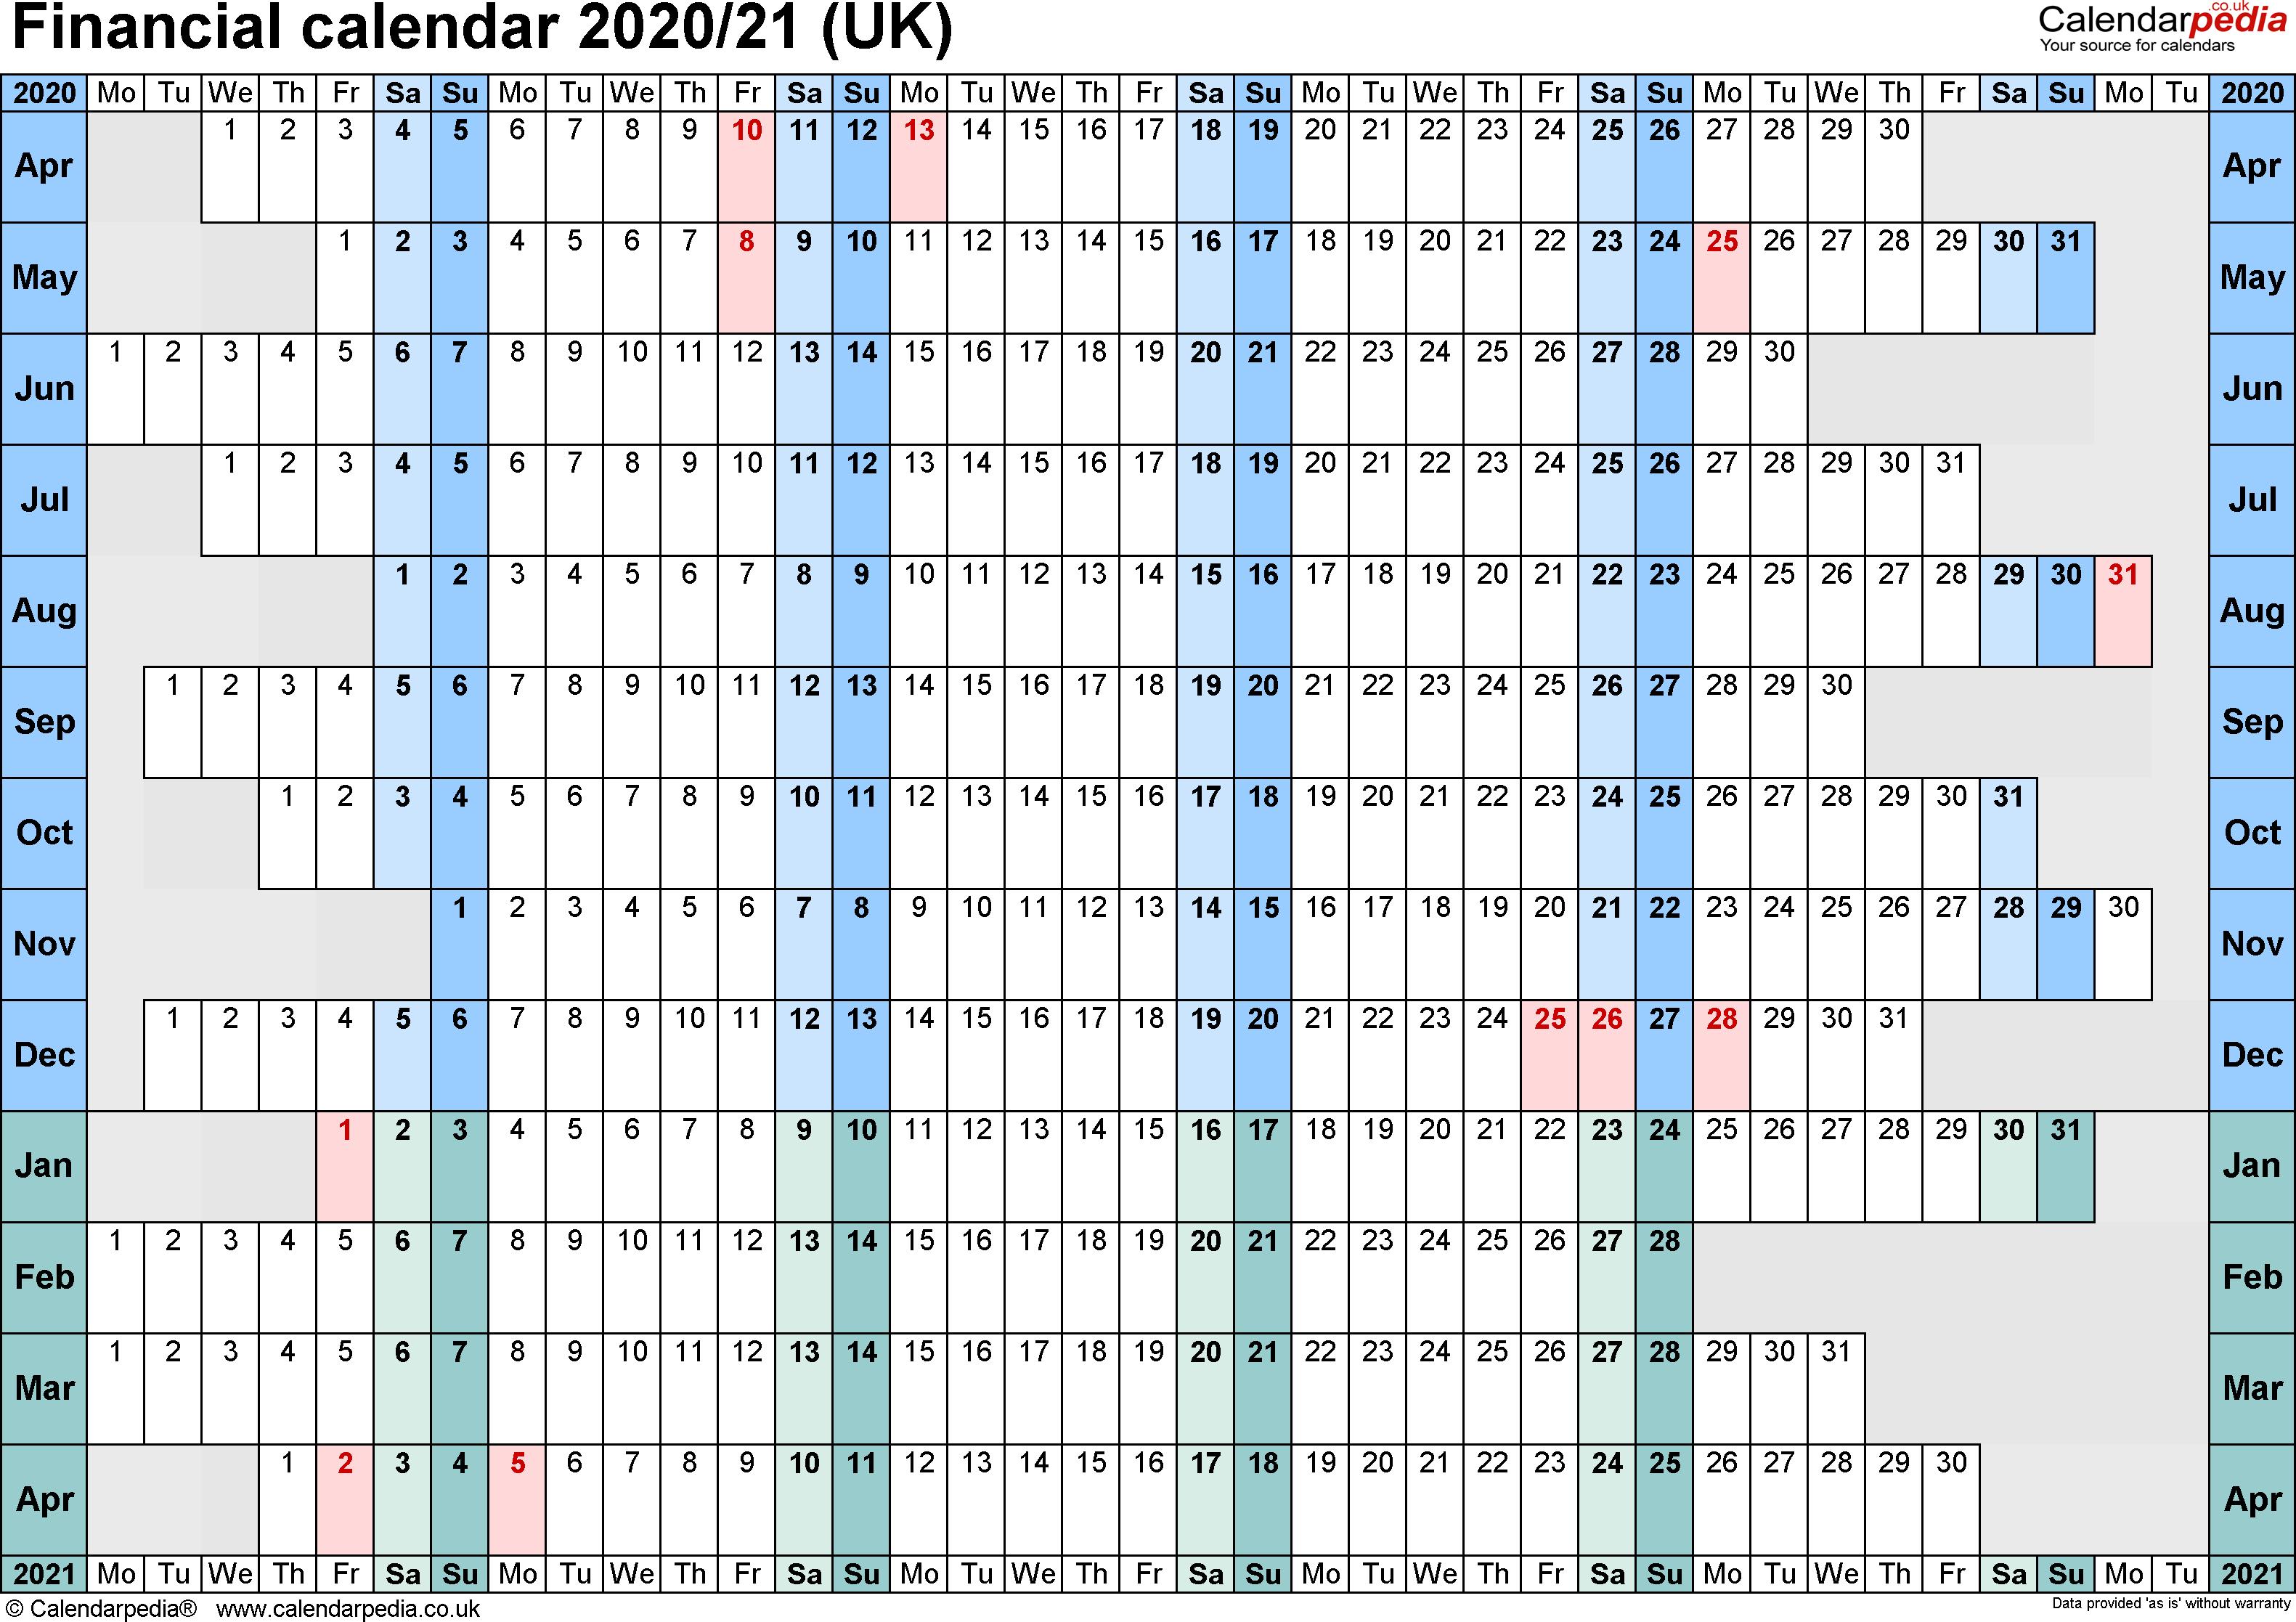 Financial Calendars 2020/21 (Uk) In Pdf Format for Hmrc Tax 2019 - 2020 Calendars